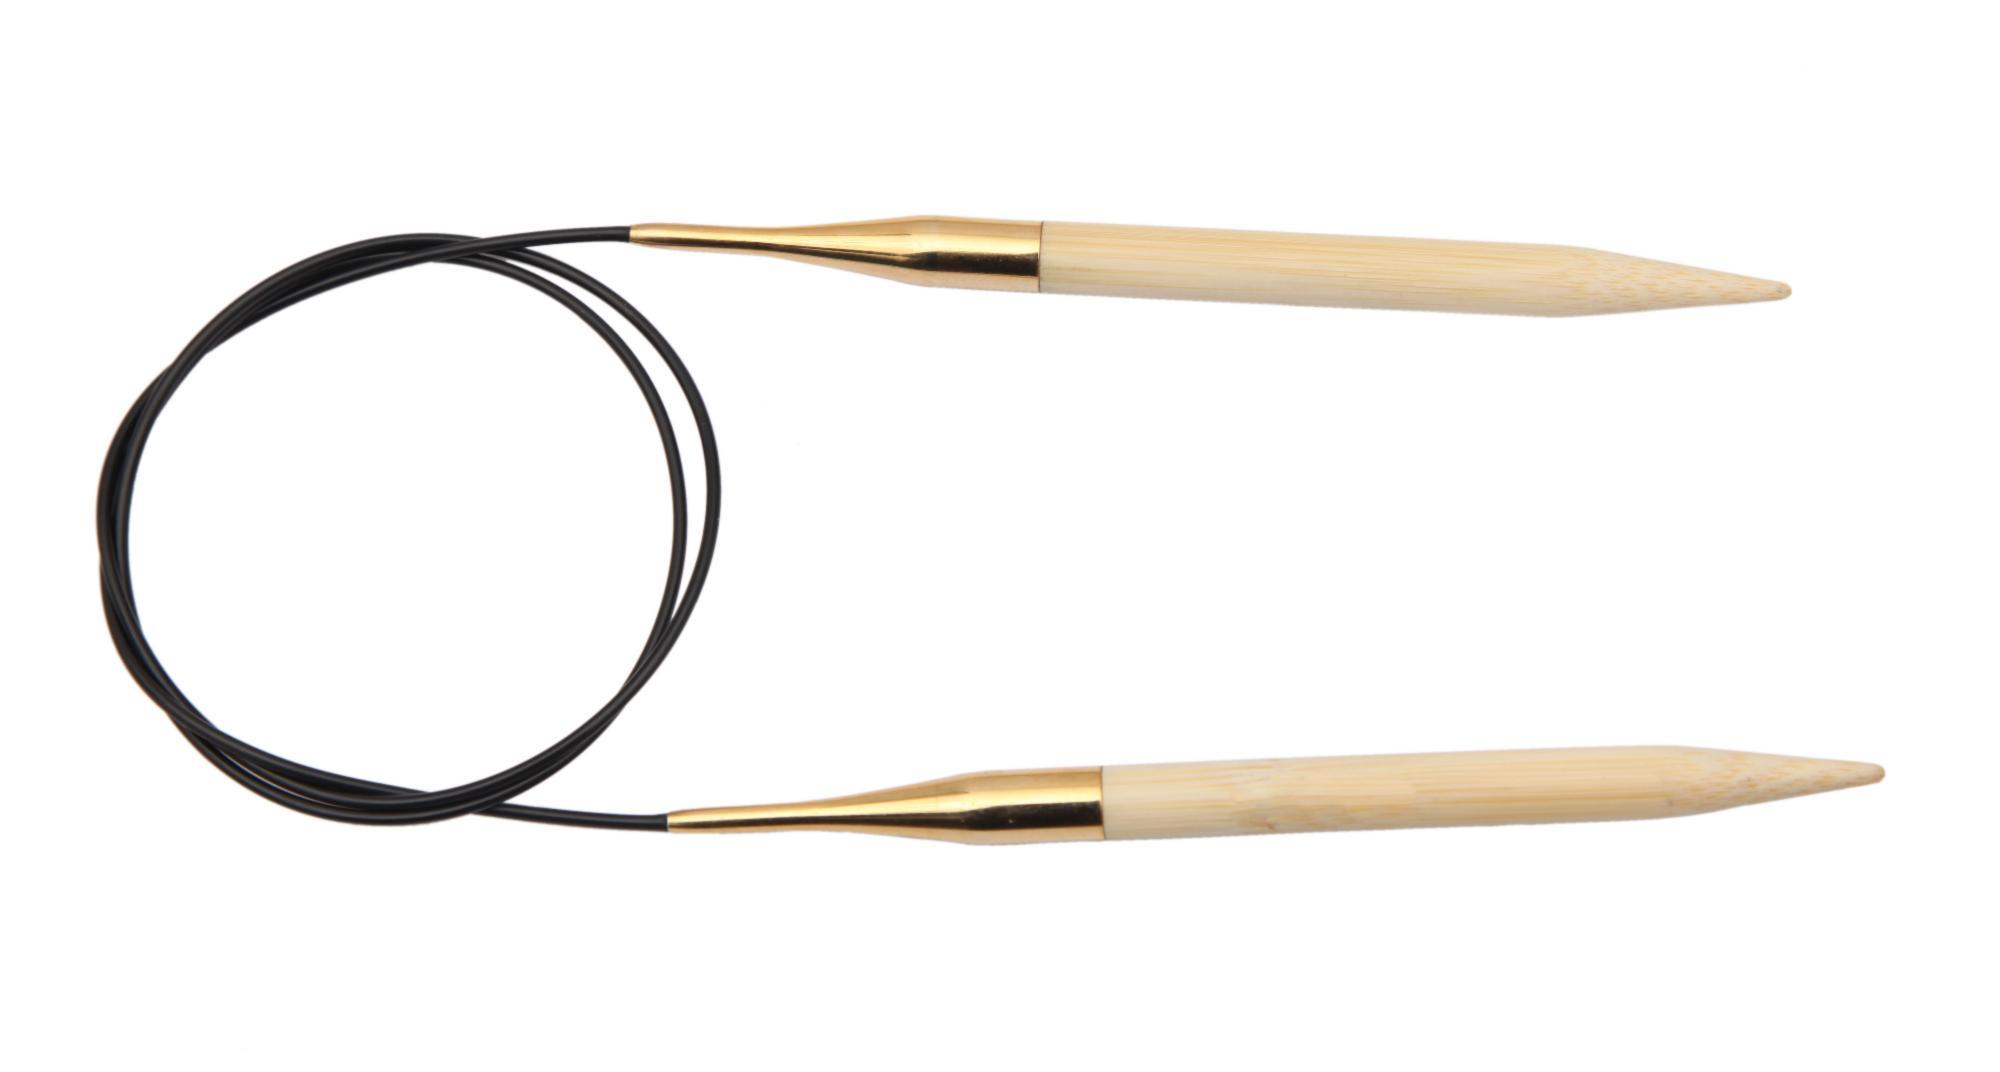 Спицы круговые 100 см Bamboo KnitPro, 22264, 2.75 мм